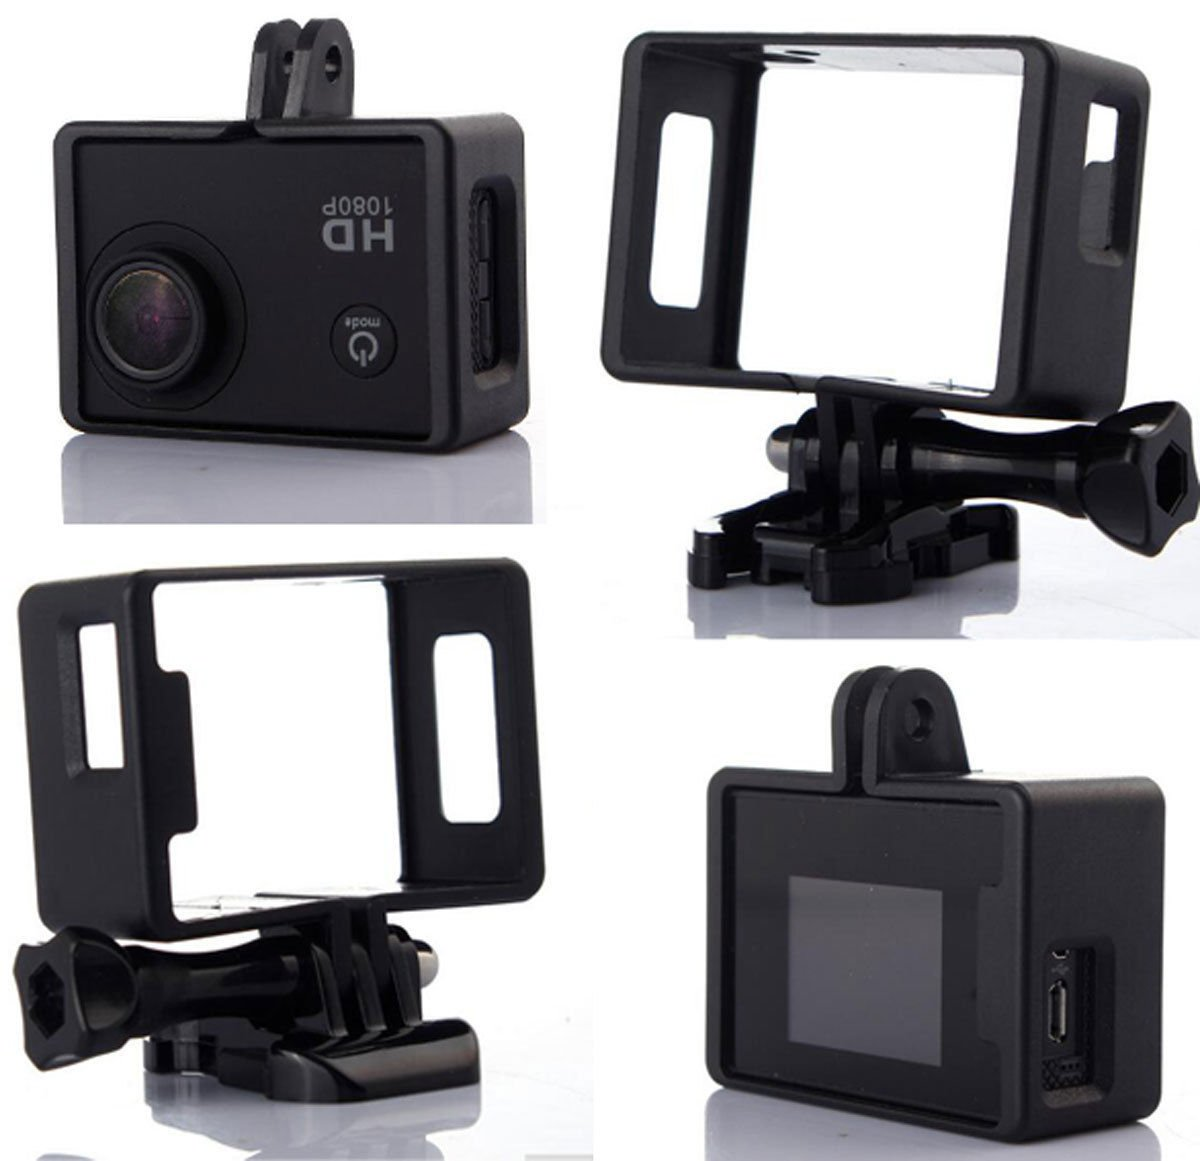 Camera Border Frame Mount Protective Housing Case Cover For SJ4000/SJ4000WIFI     FR5